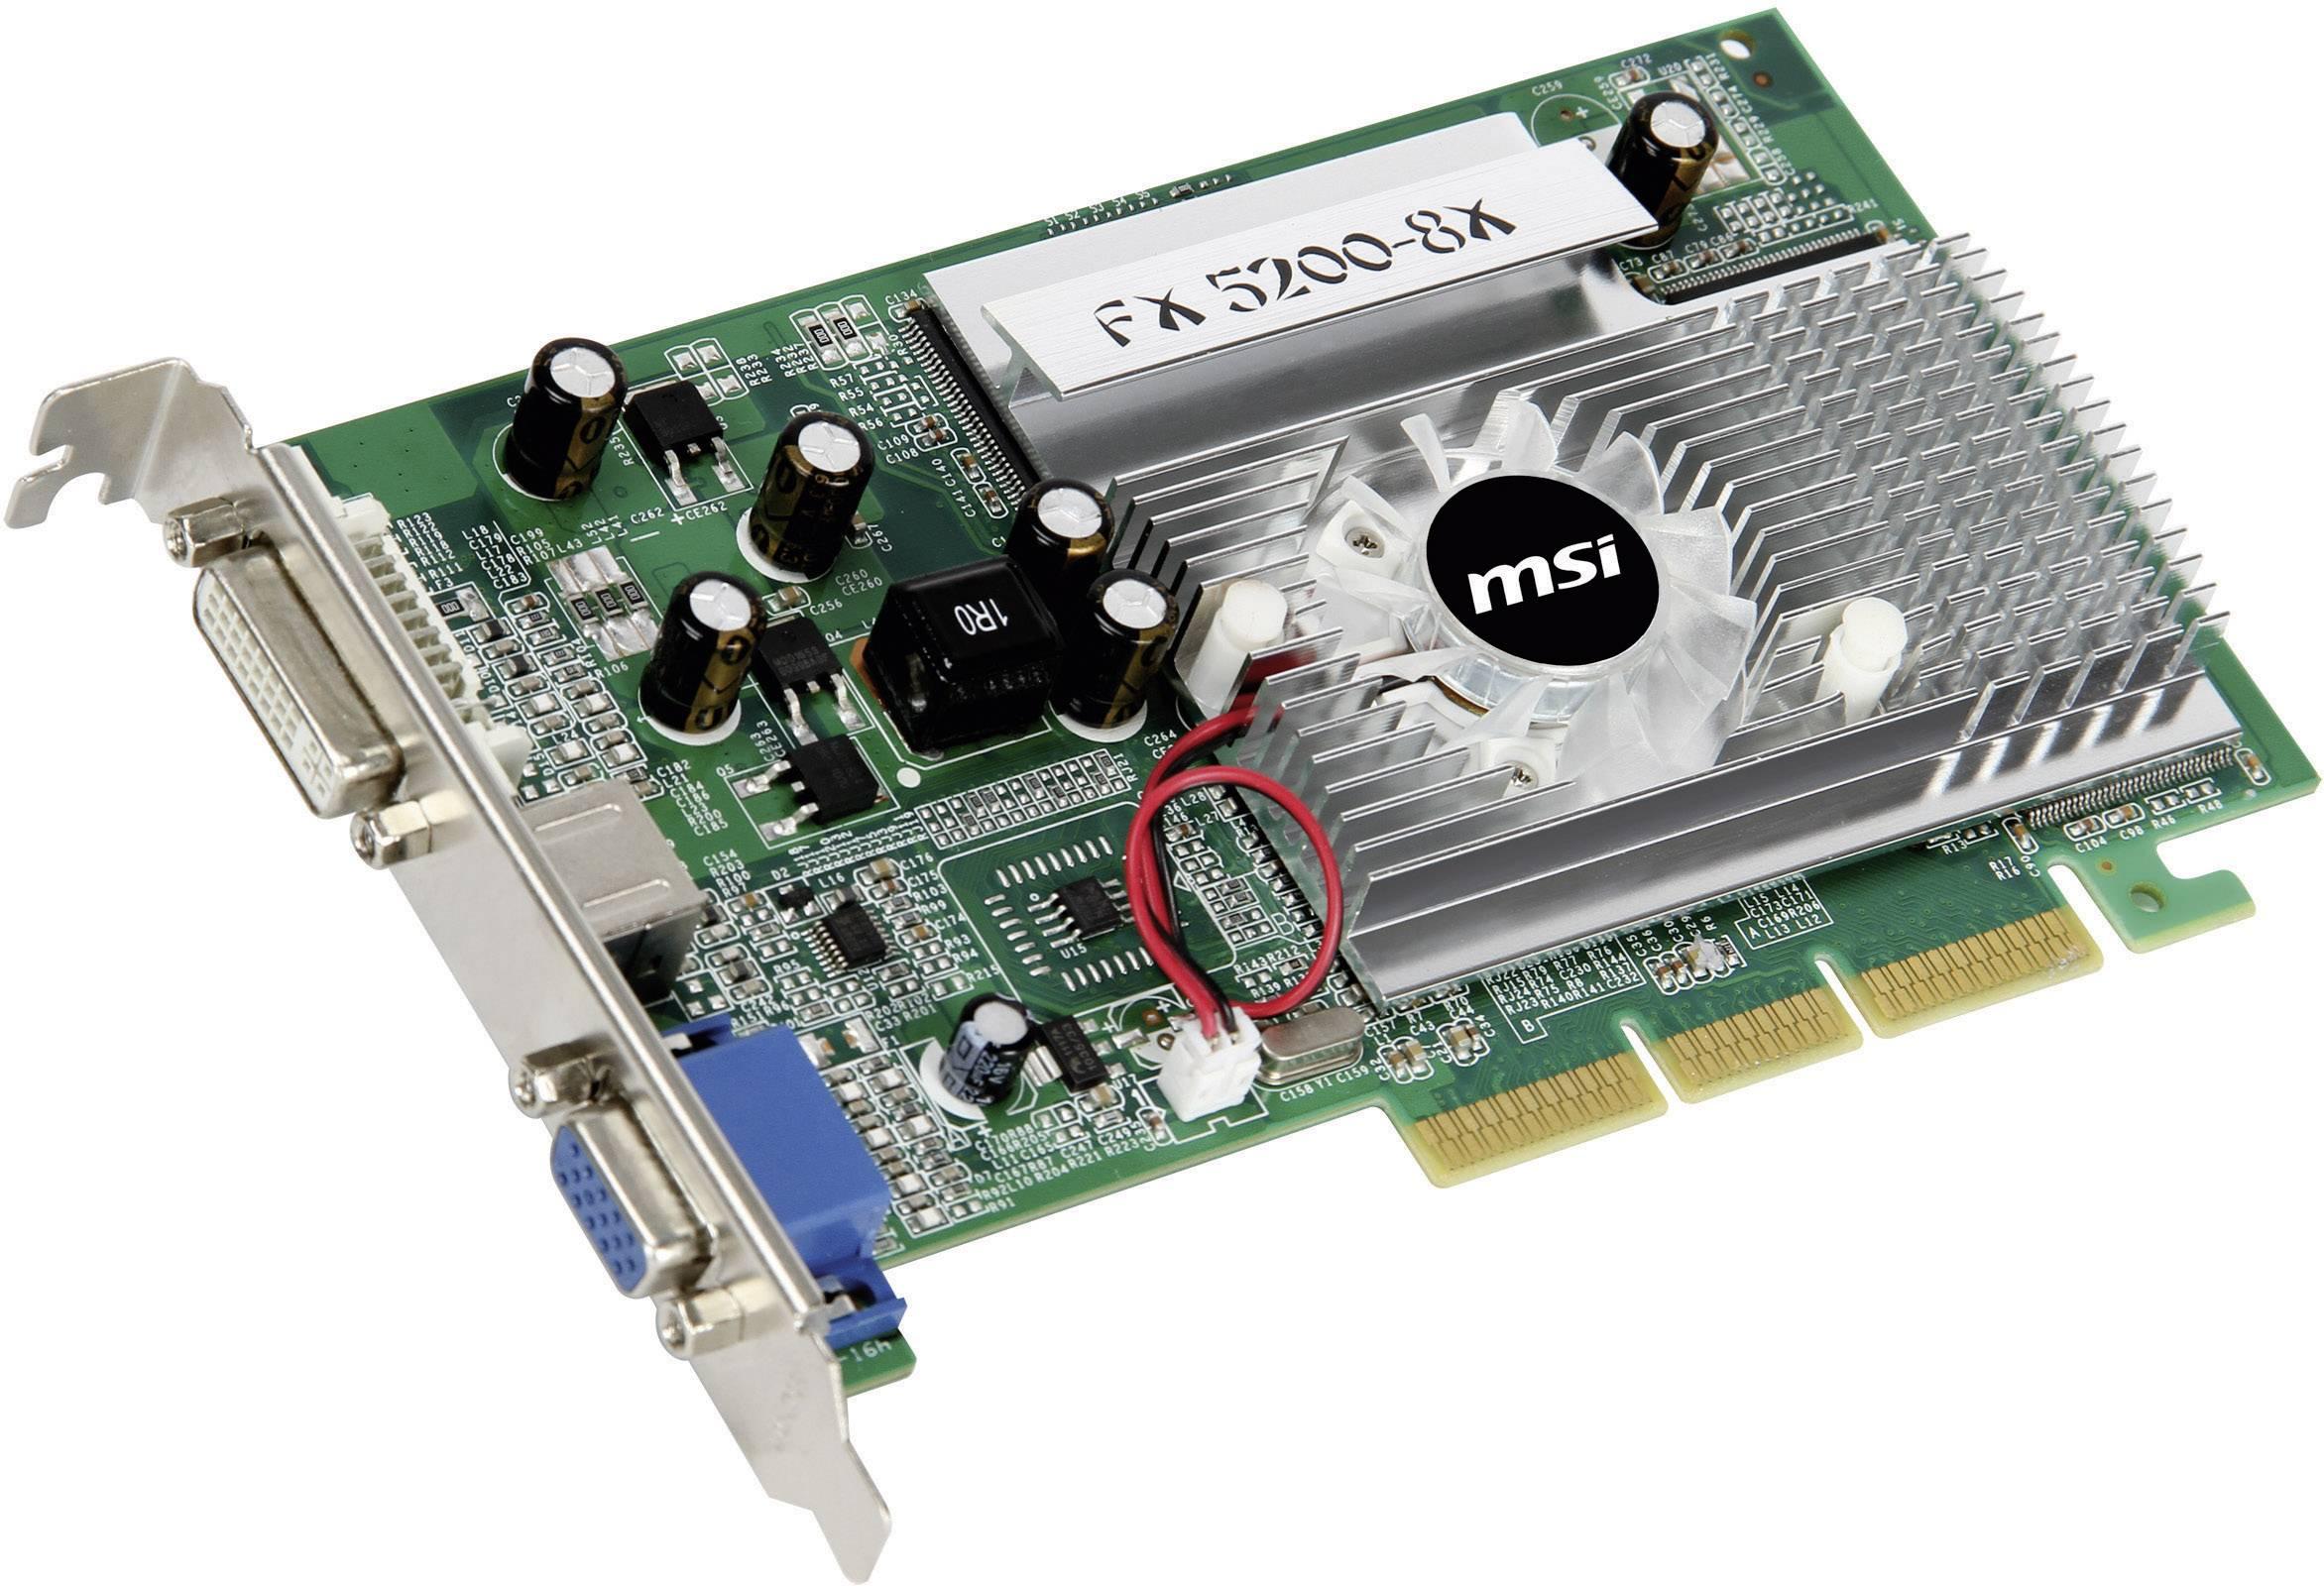 pilote carte graphique nvidia geforce fx 5200